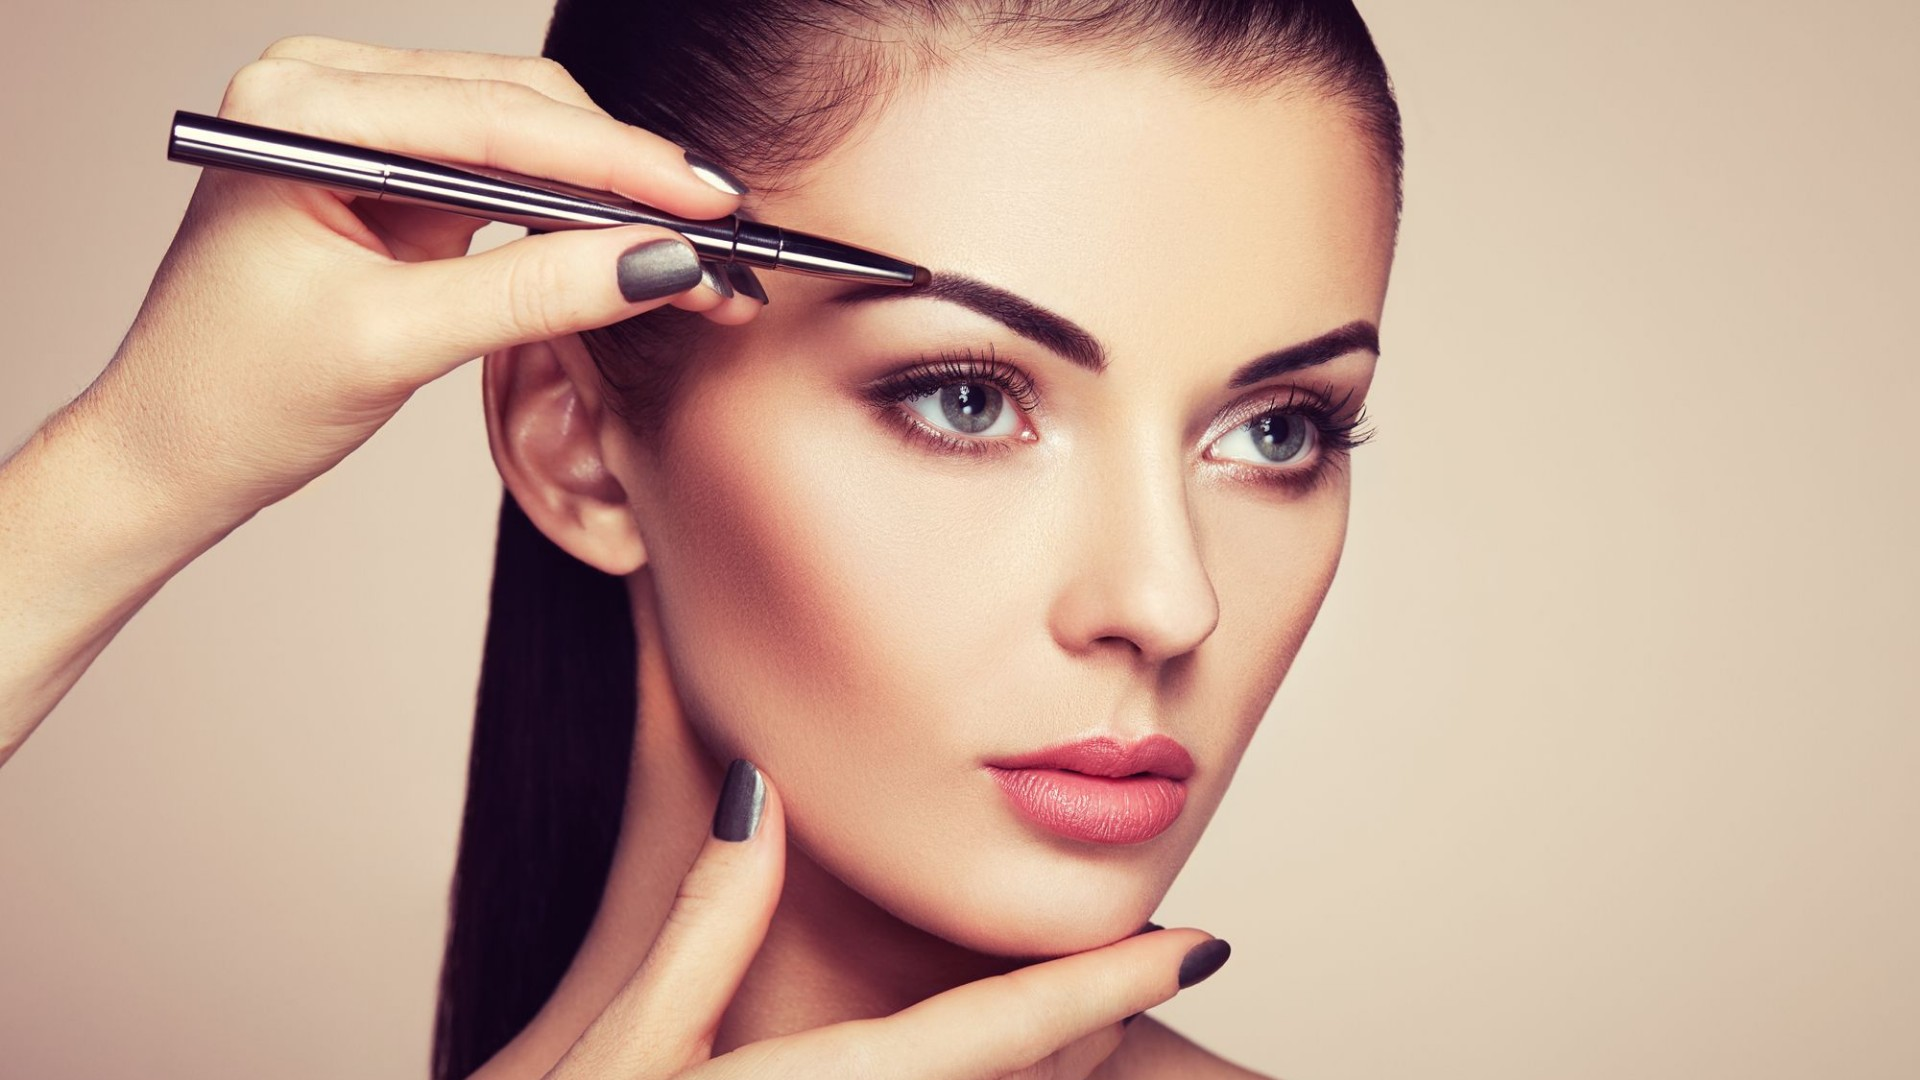 000 Micropigmentacion microblanding ojos cejas  belleza estetica